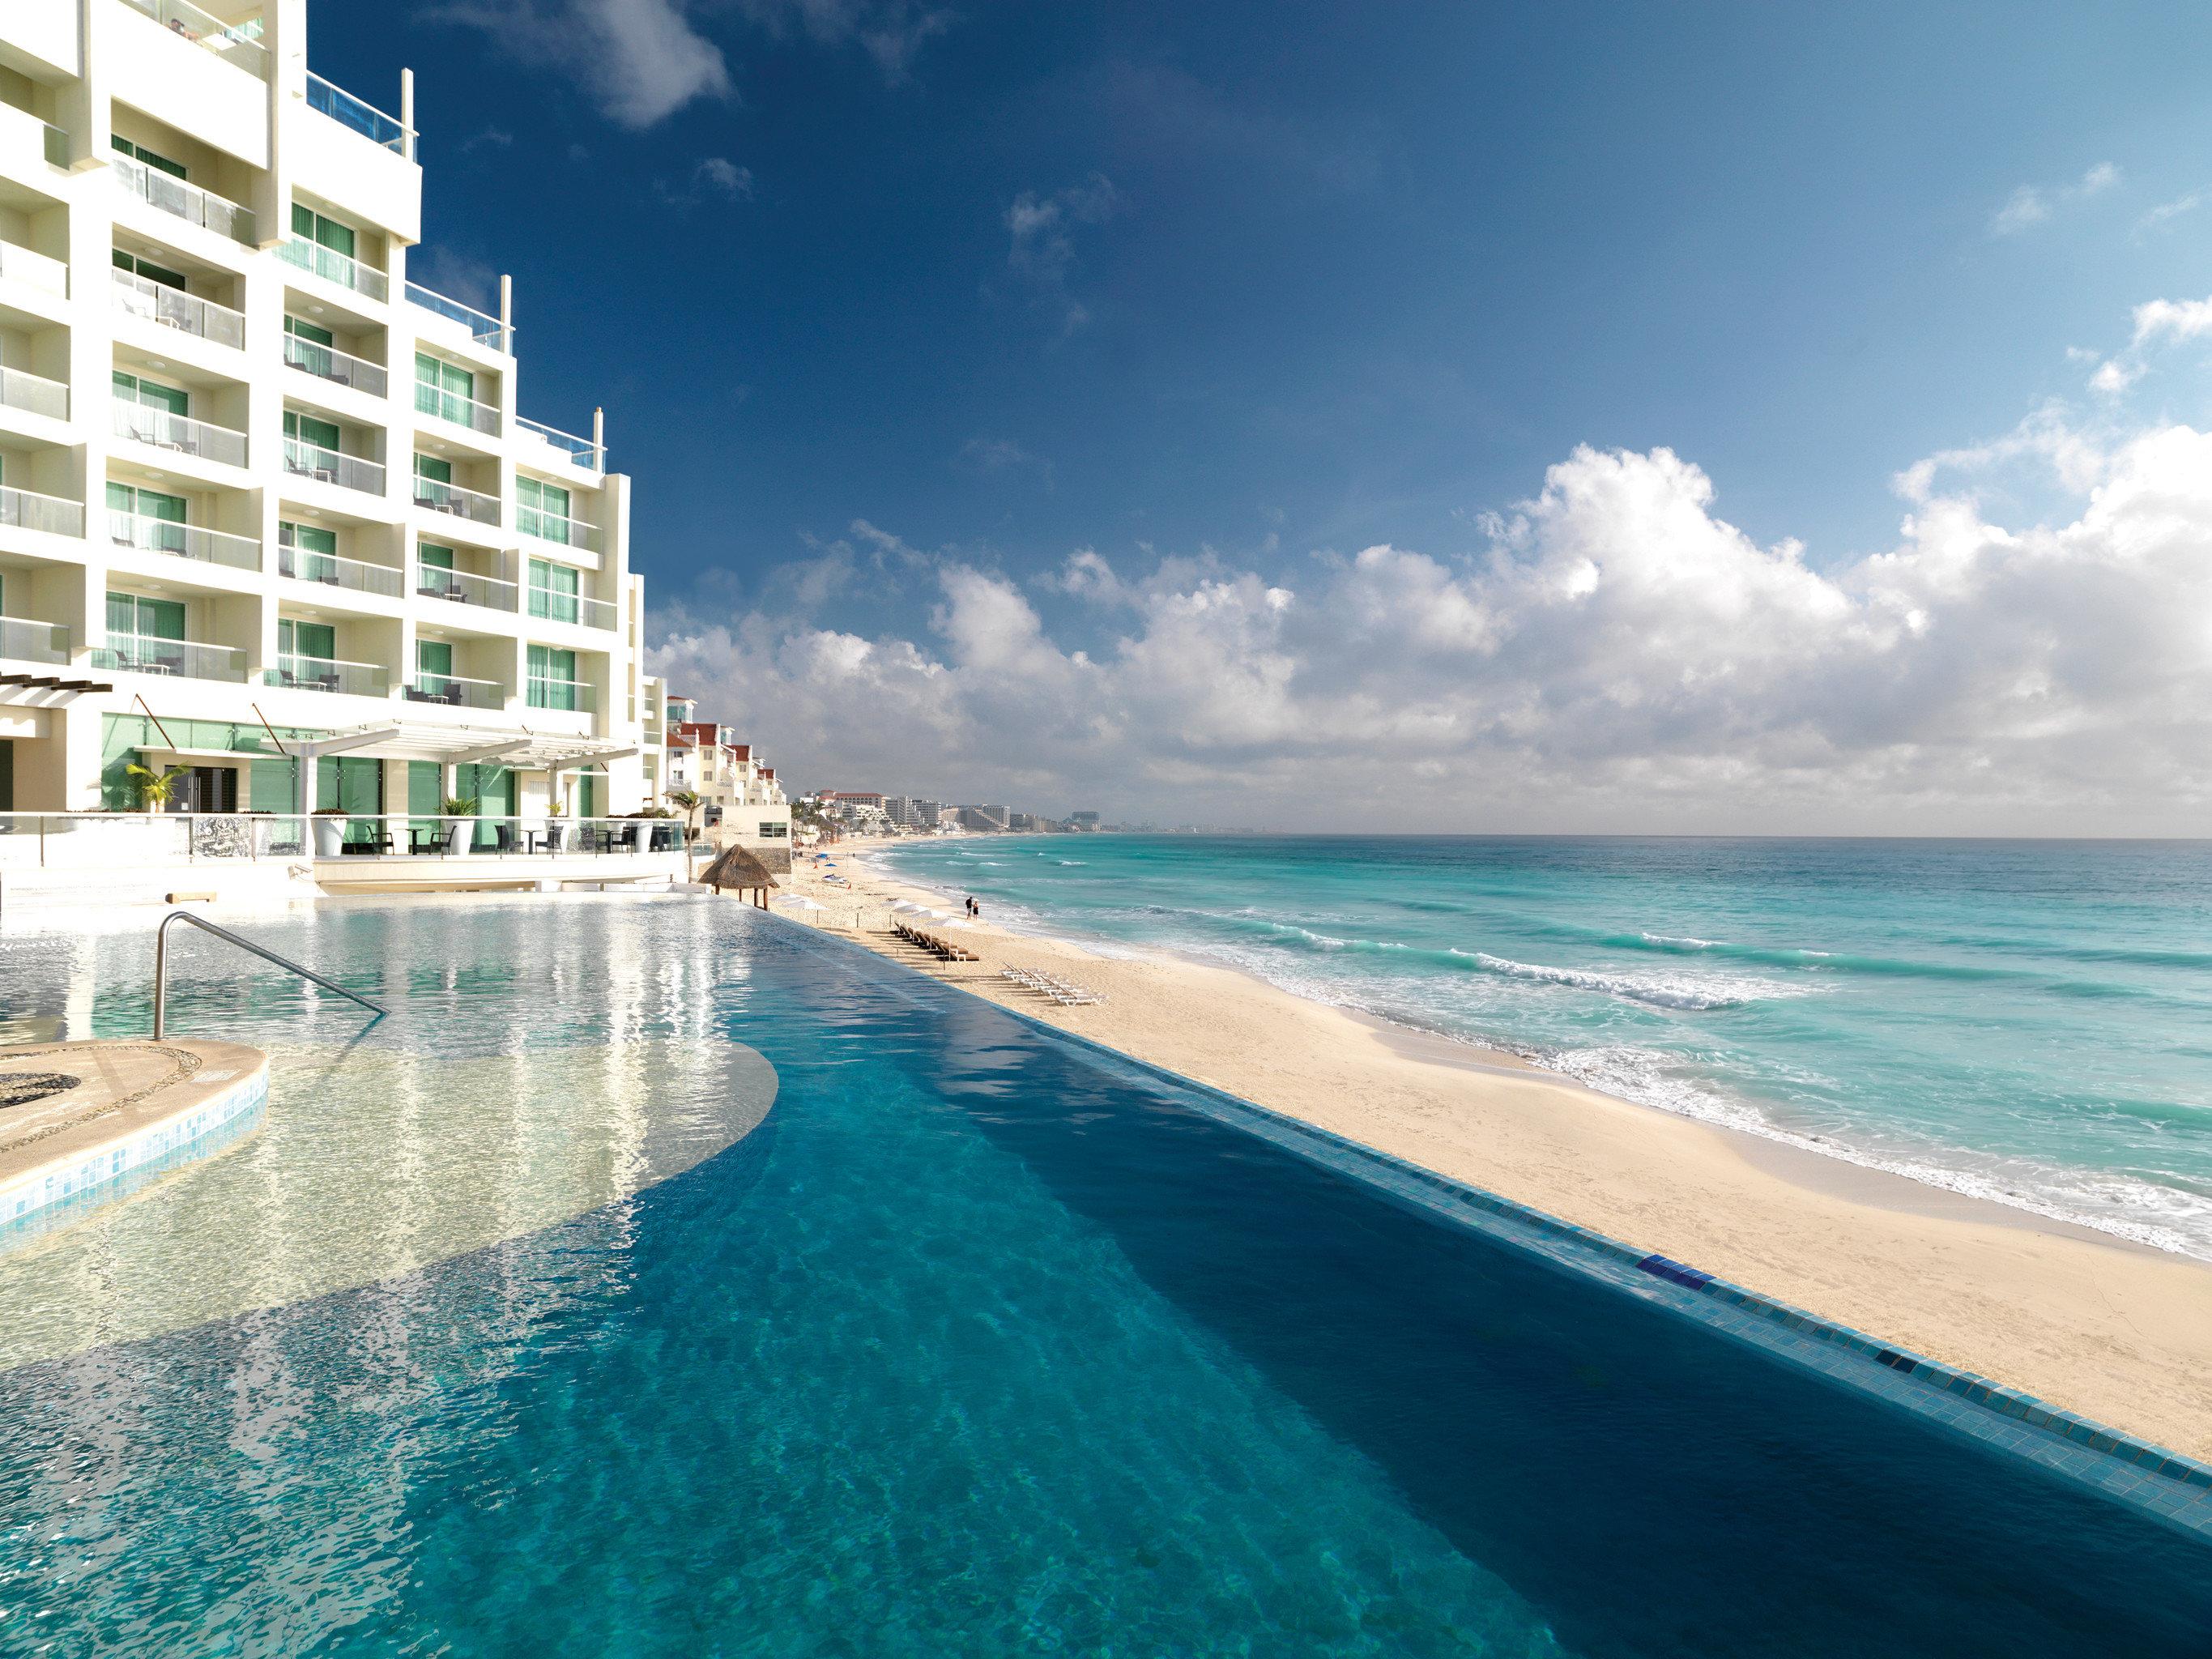 Hotels sky water outdoor Sea Ocean caribbean vacation Beach horizon shore Coast Nature swimming pool bay Resort cape wind wave Lagoon day